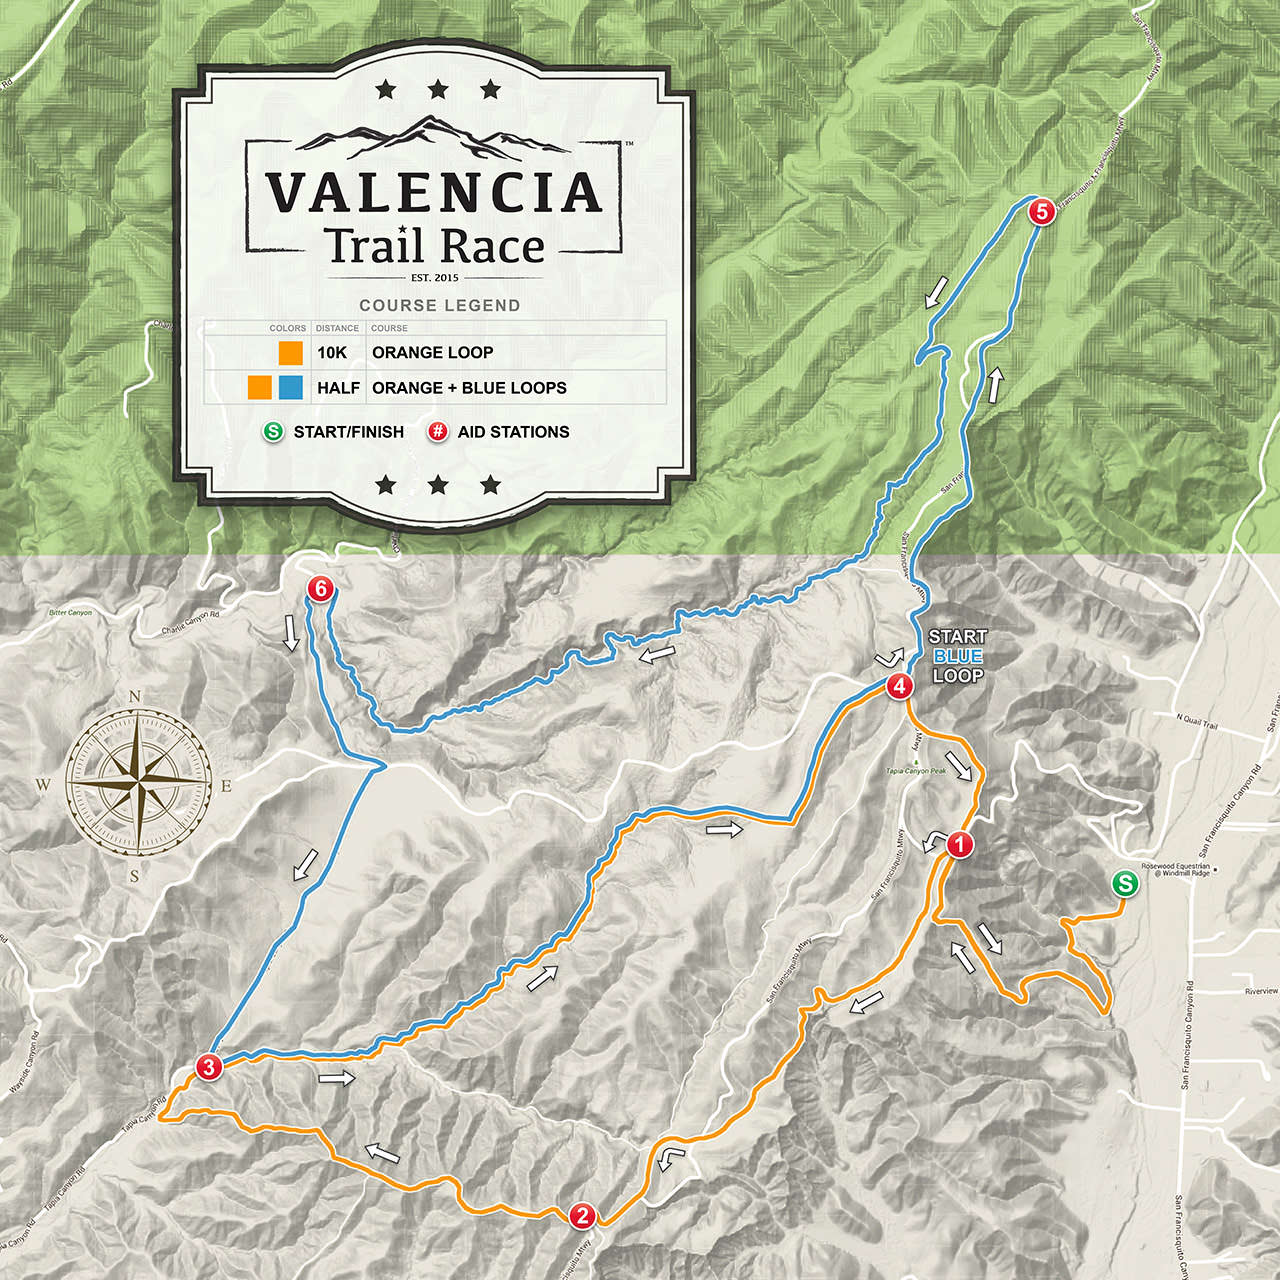 VALENCIA Trail Race - Half Marathon Course